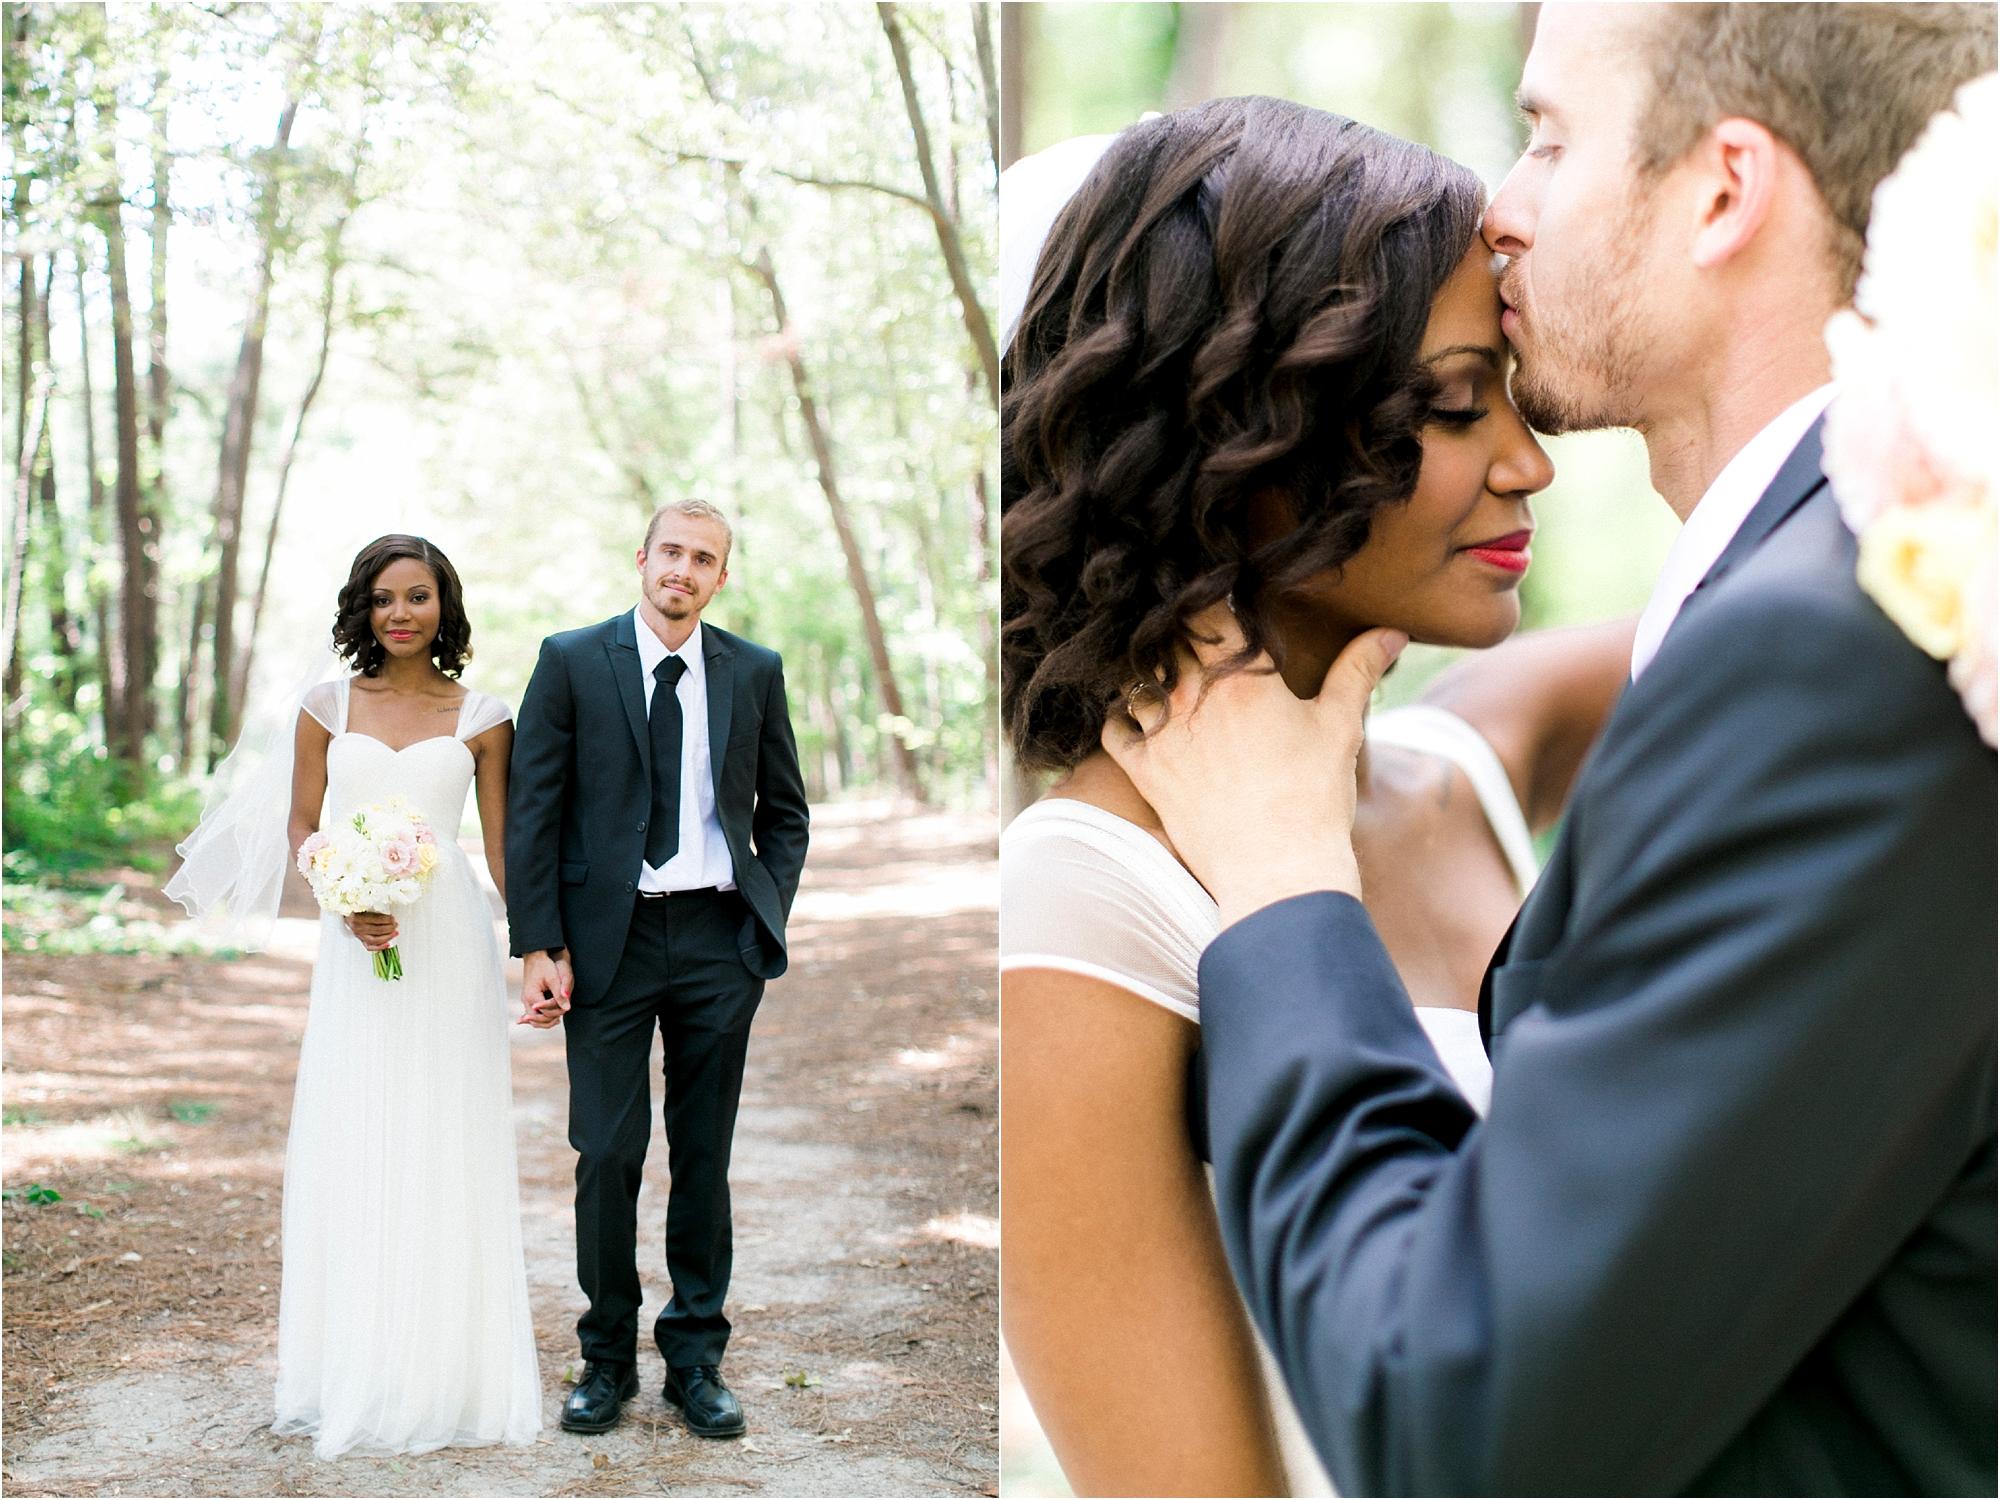 inimate-richmond-virginia-backyard-summer-wedding-photos_0020.jpg